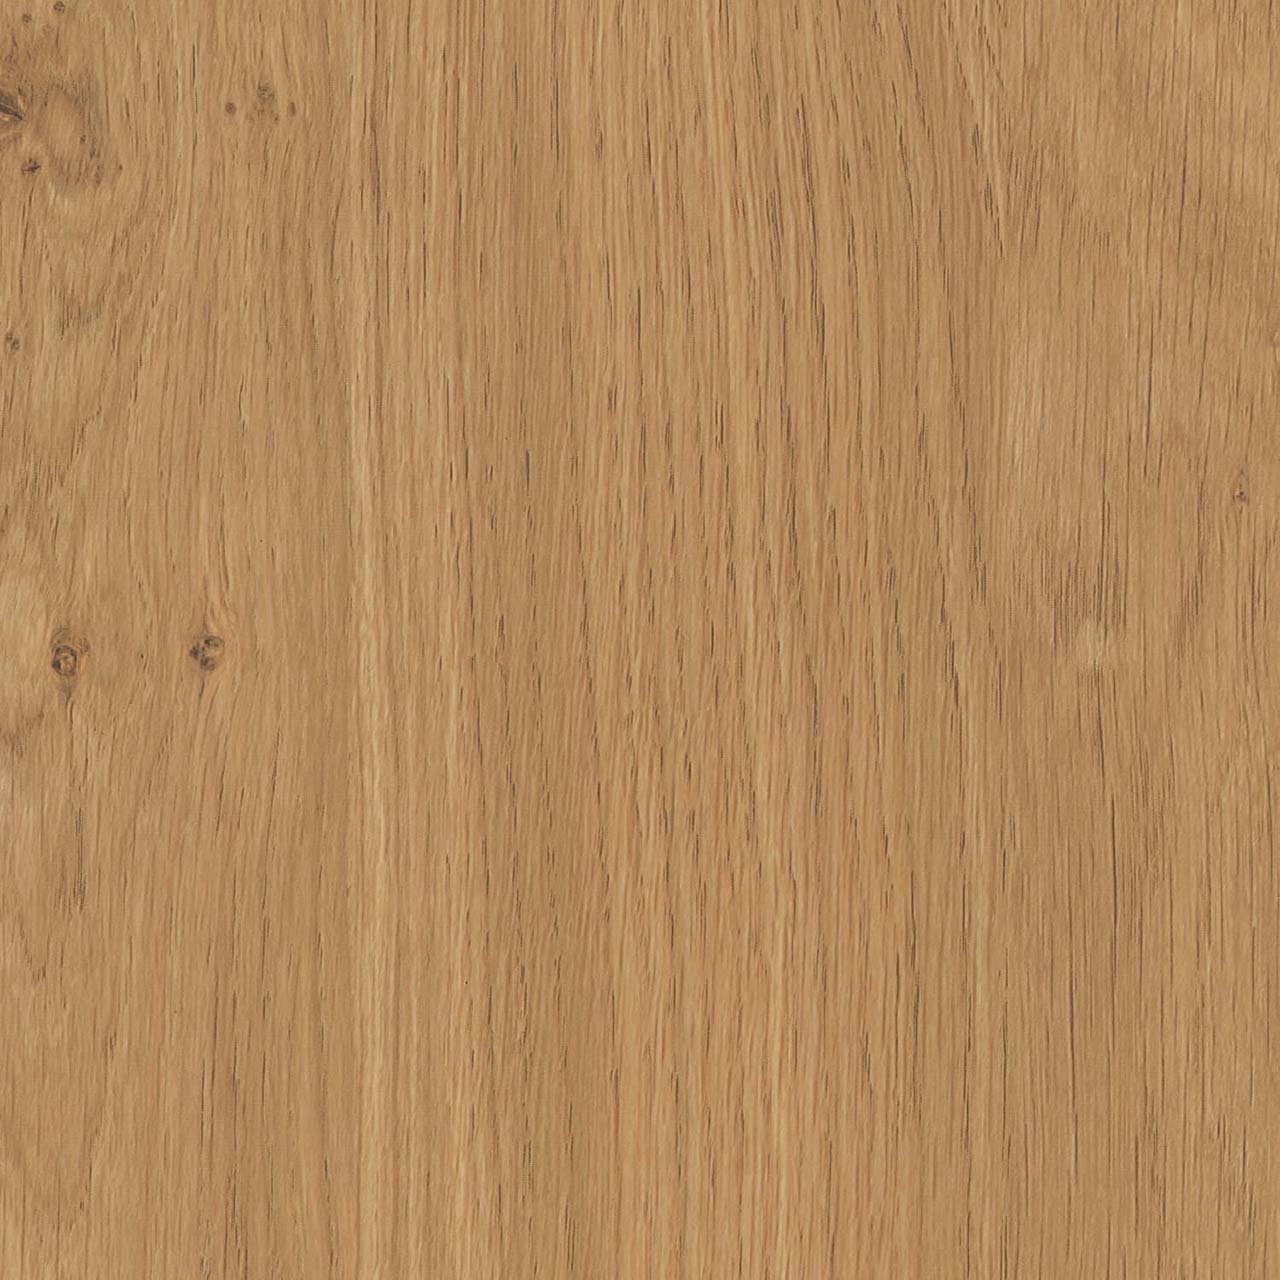 Winchester Oak effect laminate panel